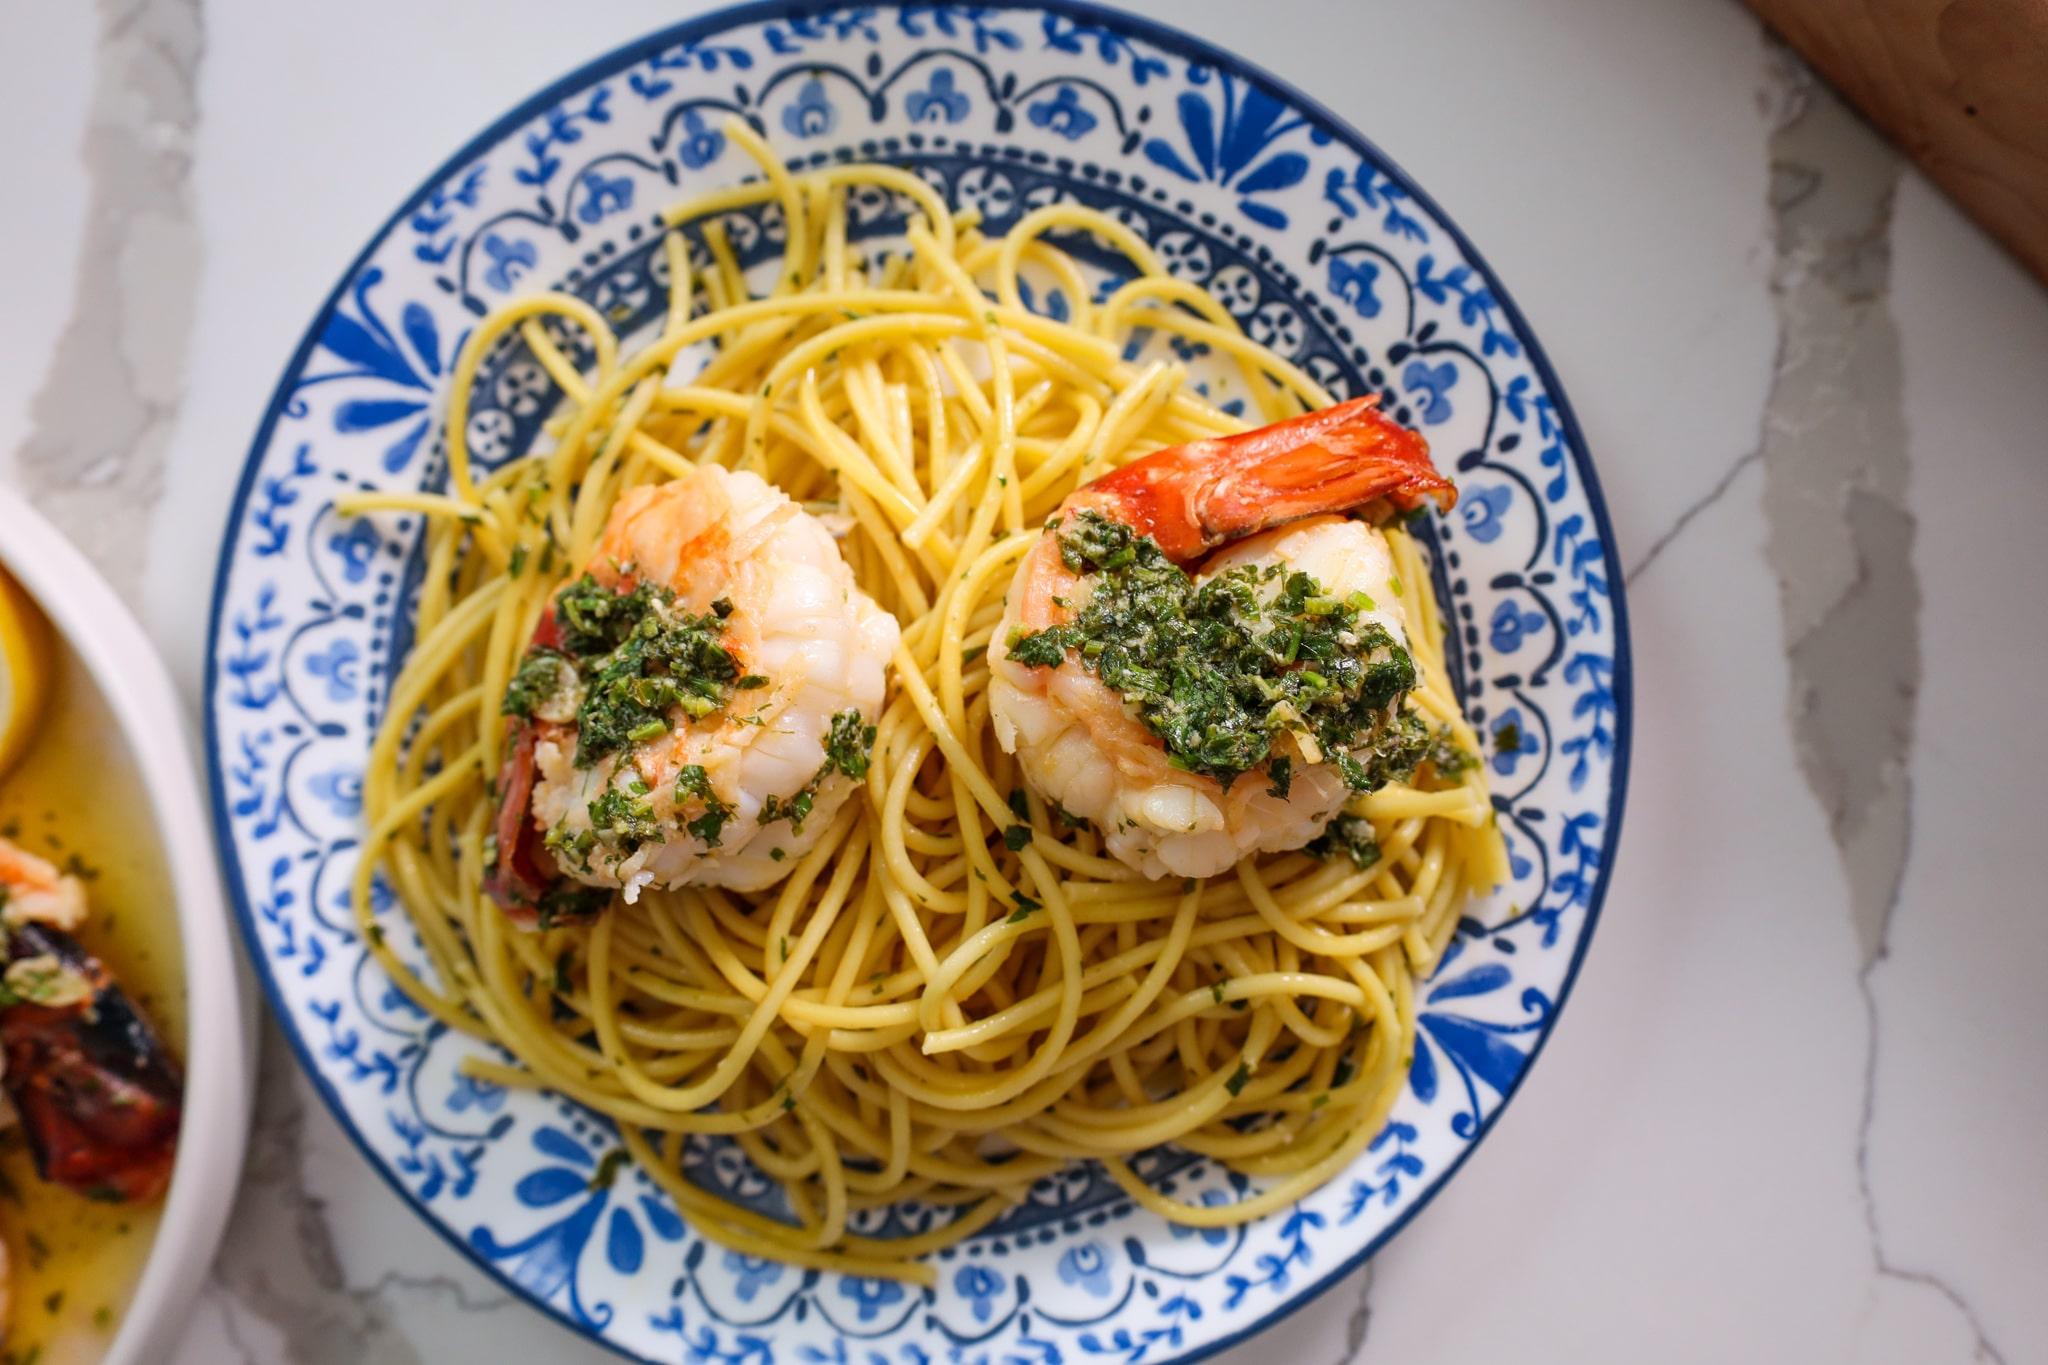 prawn scampi with parsley